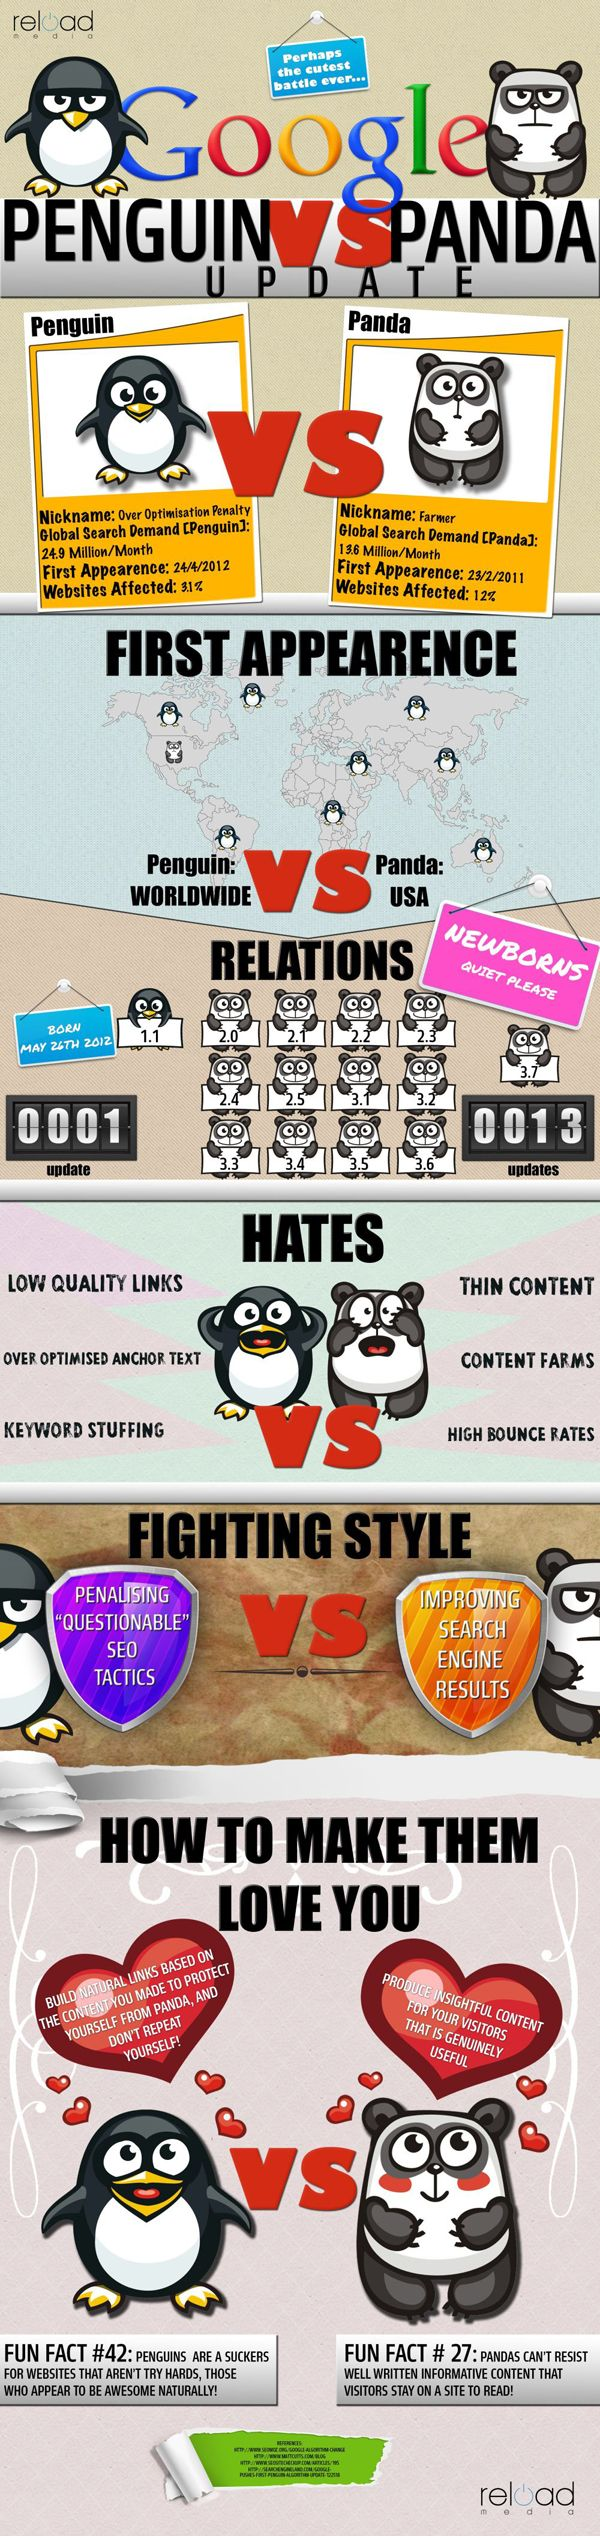 google penguin vs panda update